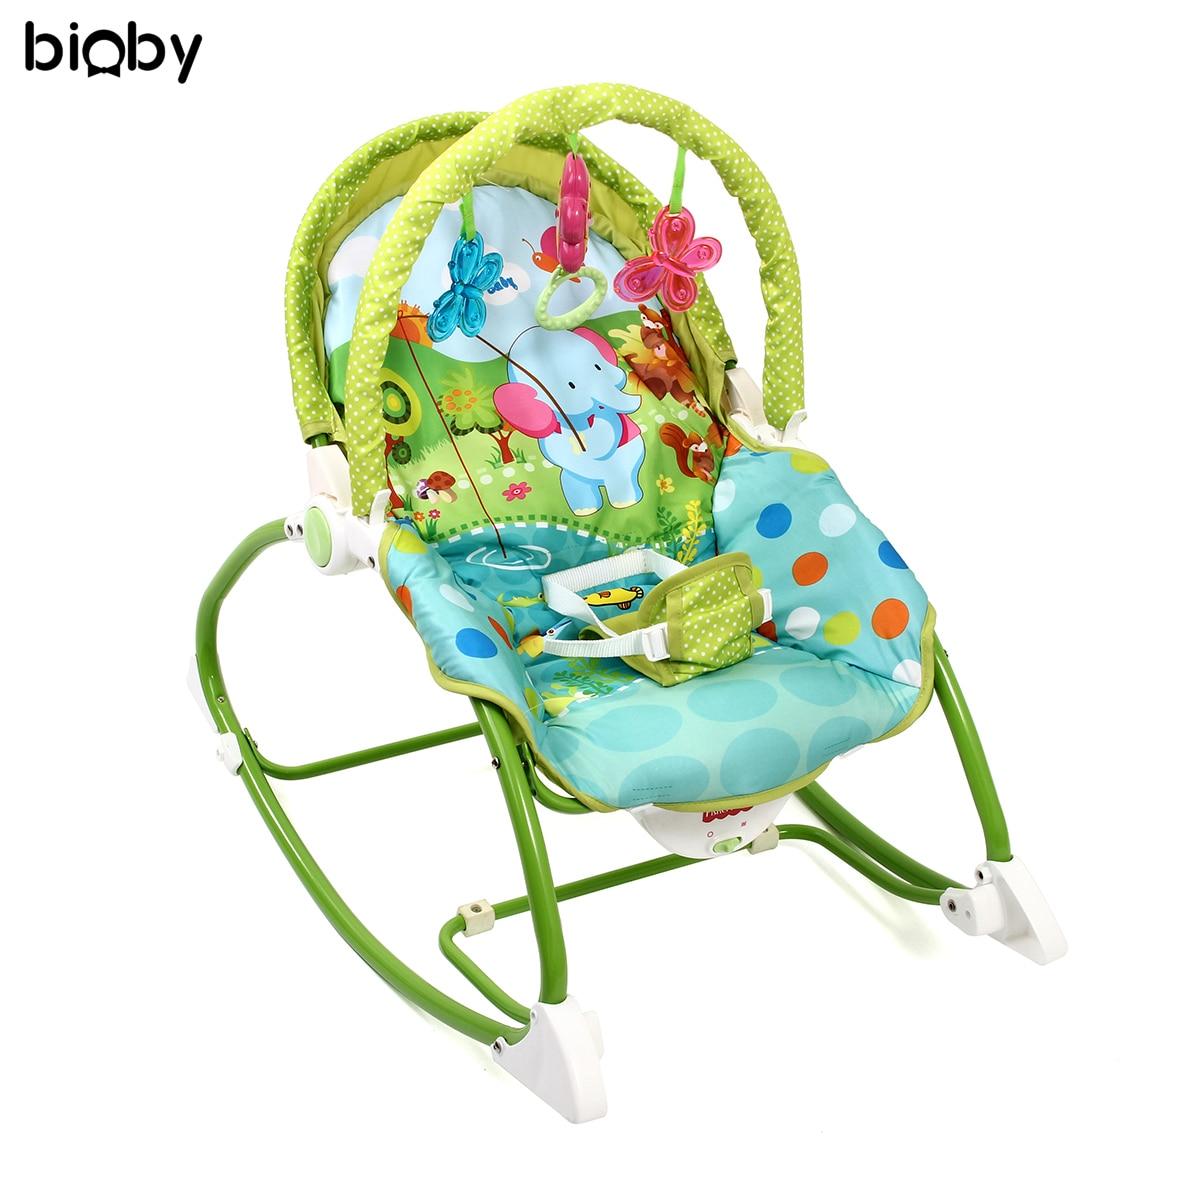 купить Baby Infant Music Care Chair Folding Cradle Seat Baby Rocking Bouncer Vibration Swing Toys Sleeper Balance Newborn Rocker Chair по цене 2936.81 рублей